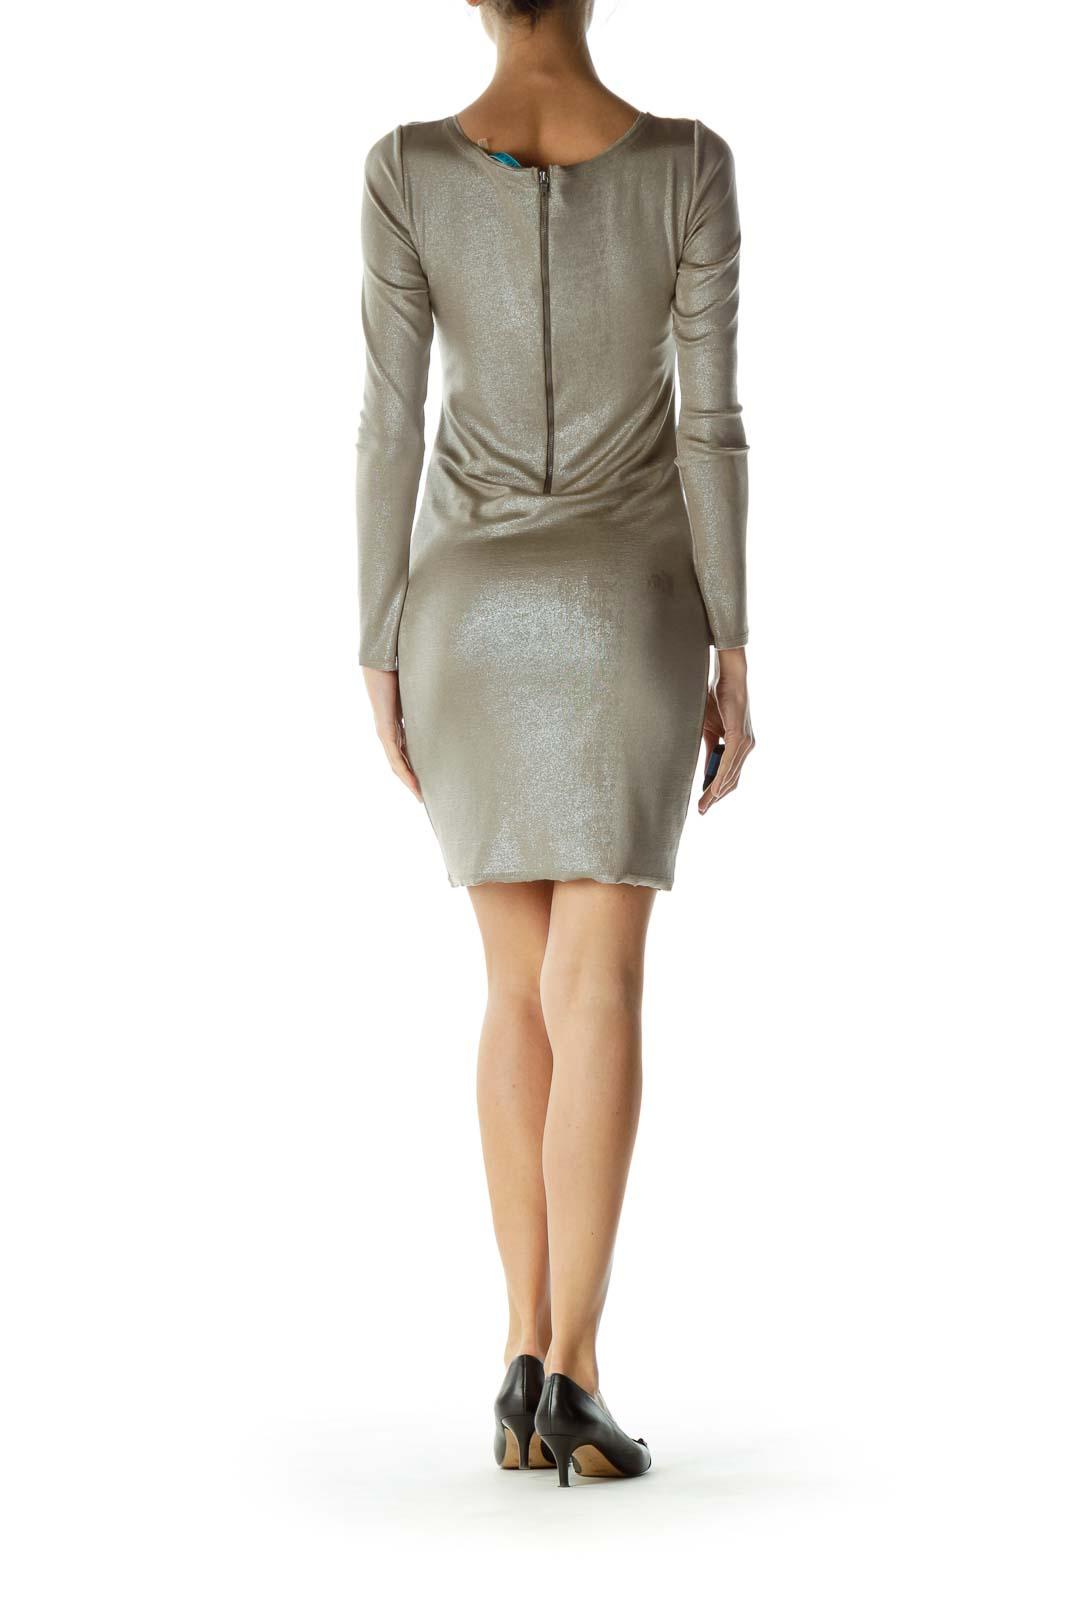 Silver Shiny Zippered Bodycon Dress